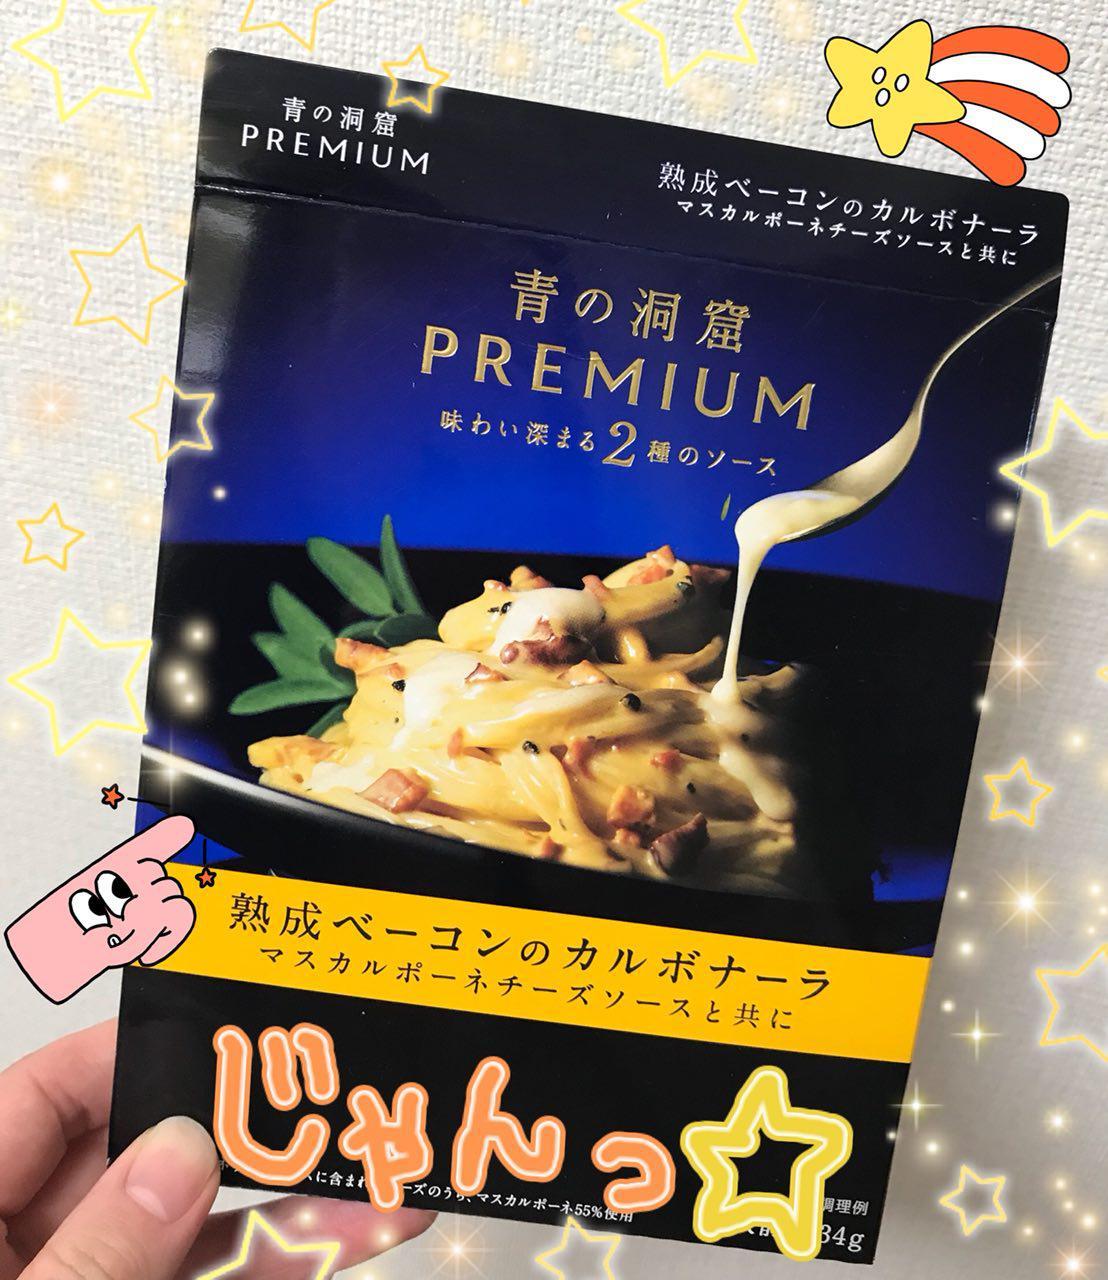 photo_2018-02-08_21-59-16.jpg